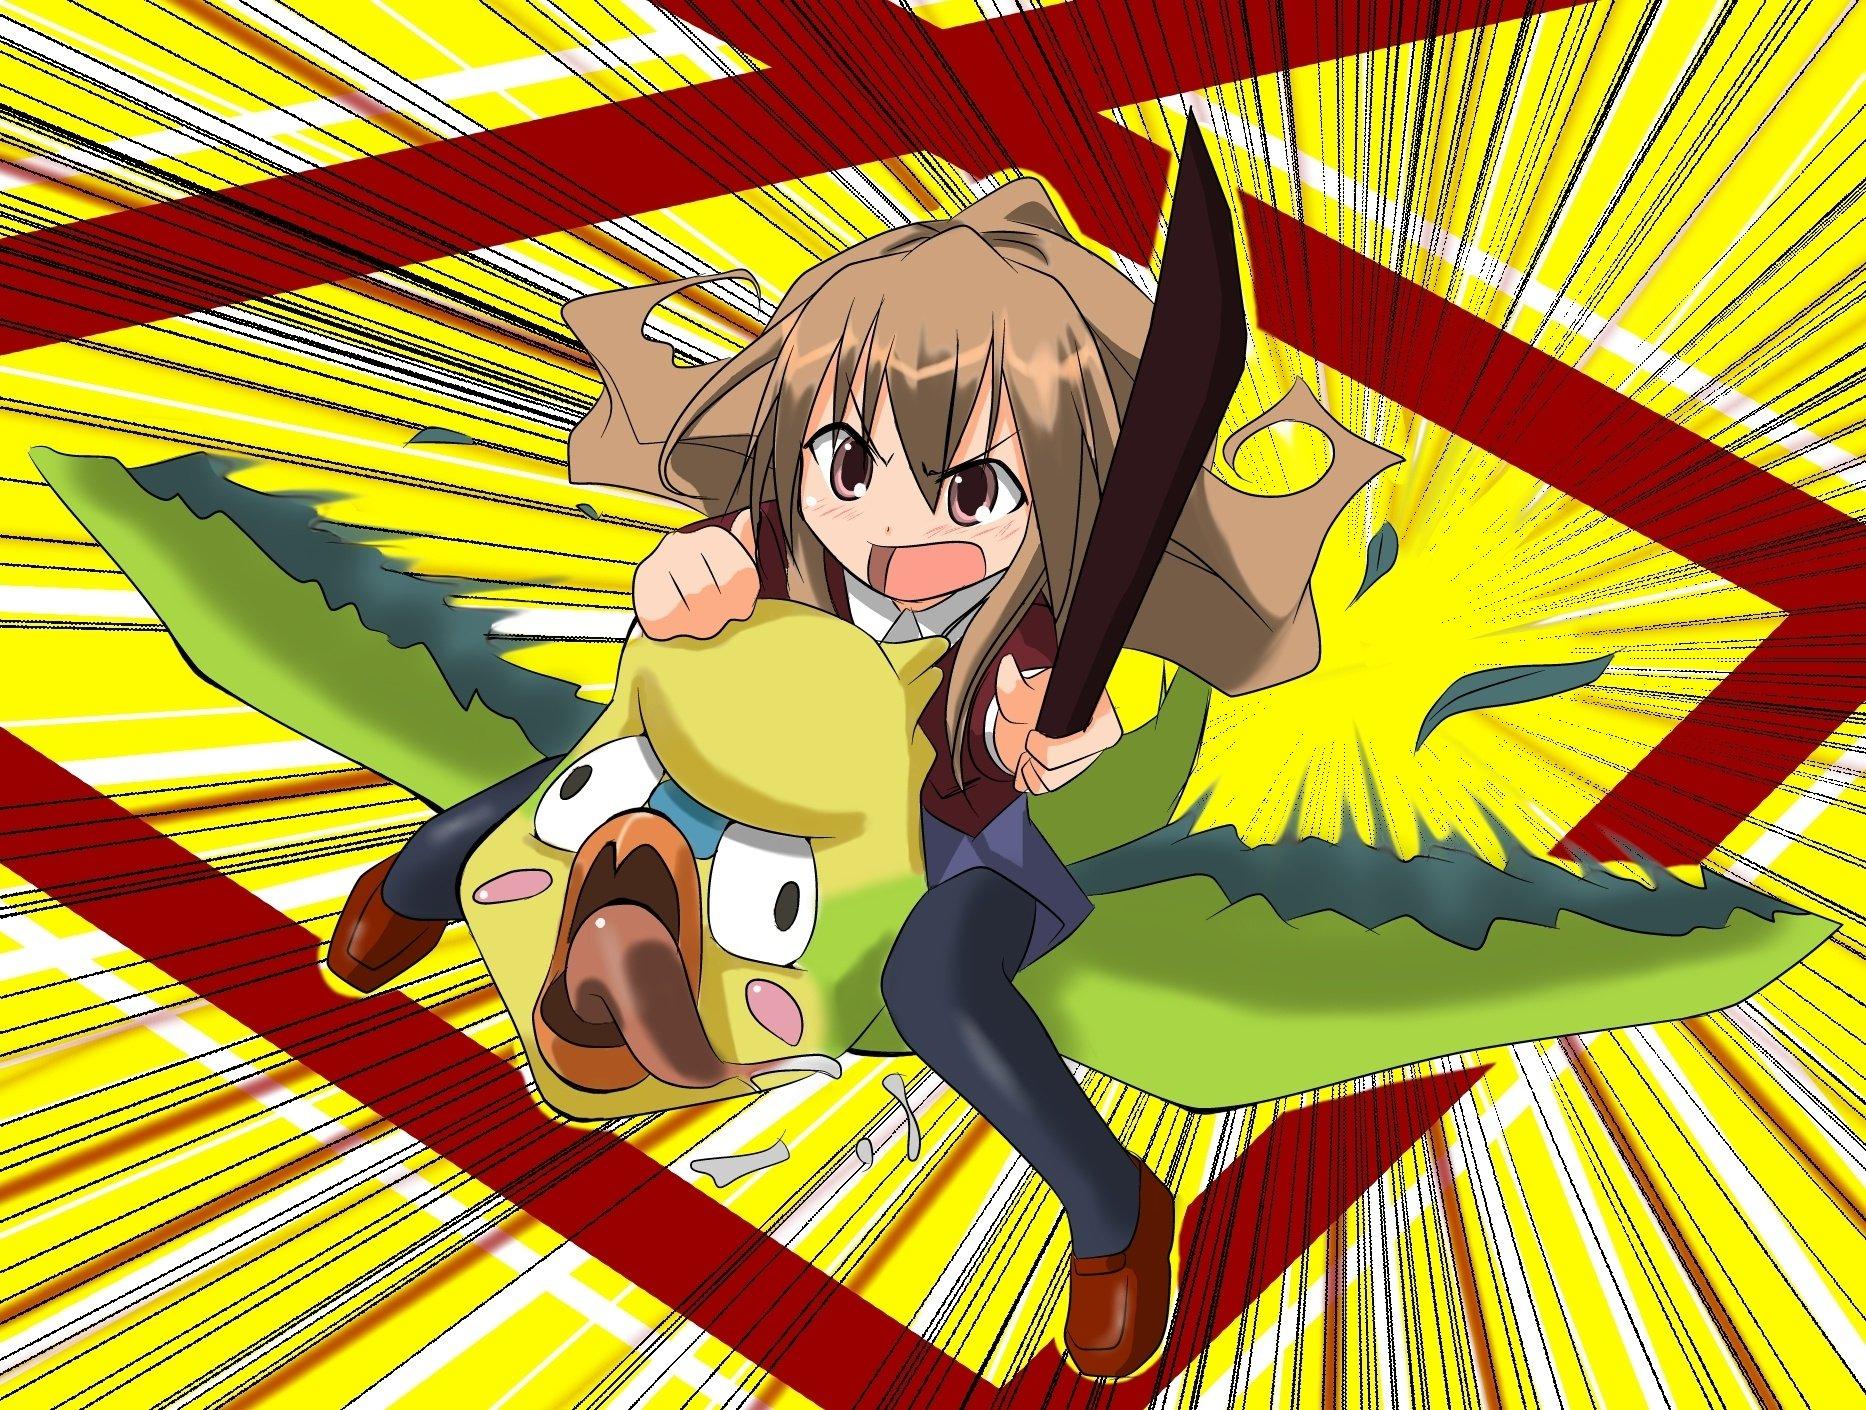 Toradora wallpaper and background image 1866x1410 id - Toradora anime wallpaper ...